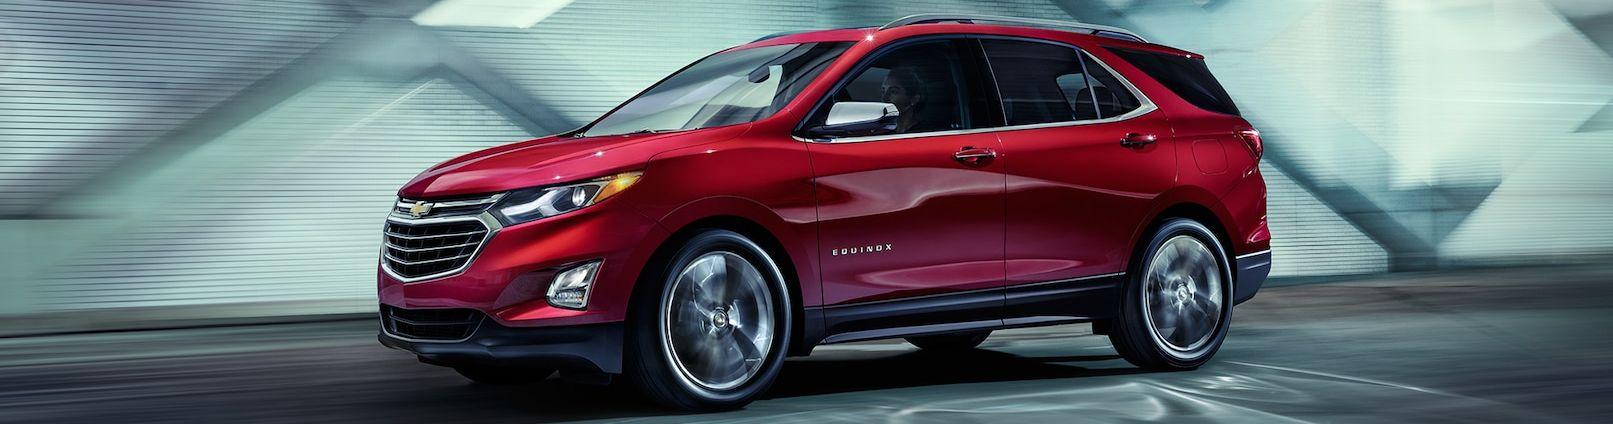 2019 Chevrolet Equinox Financing near Schererville, IN